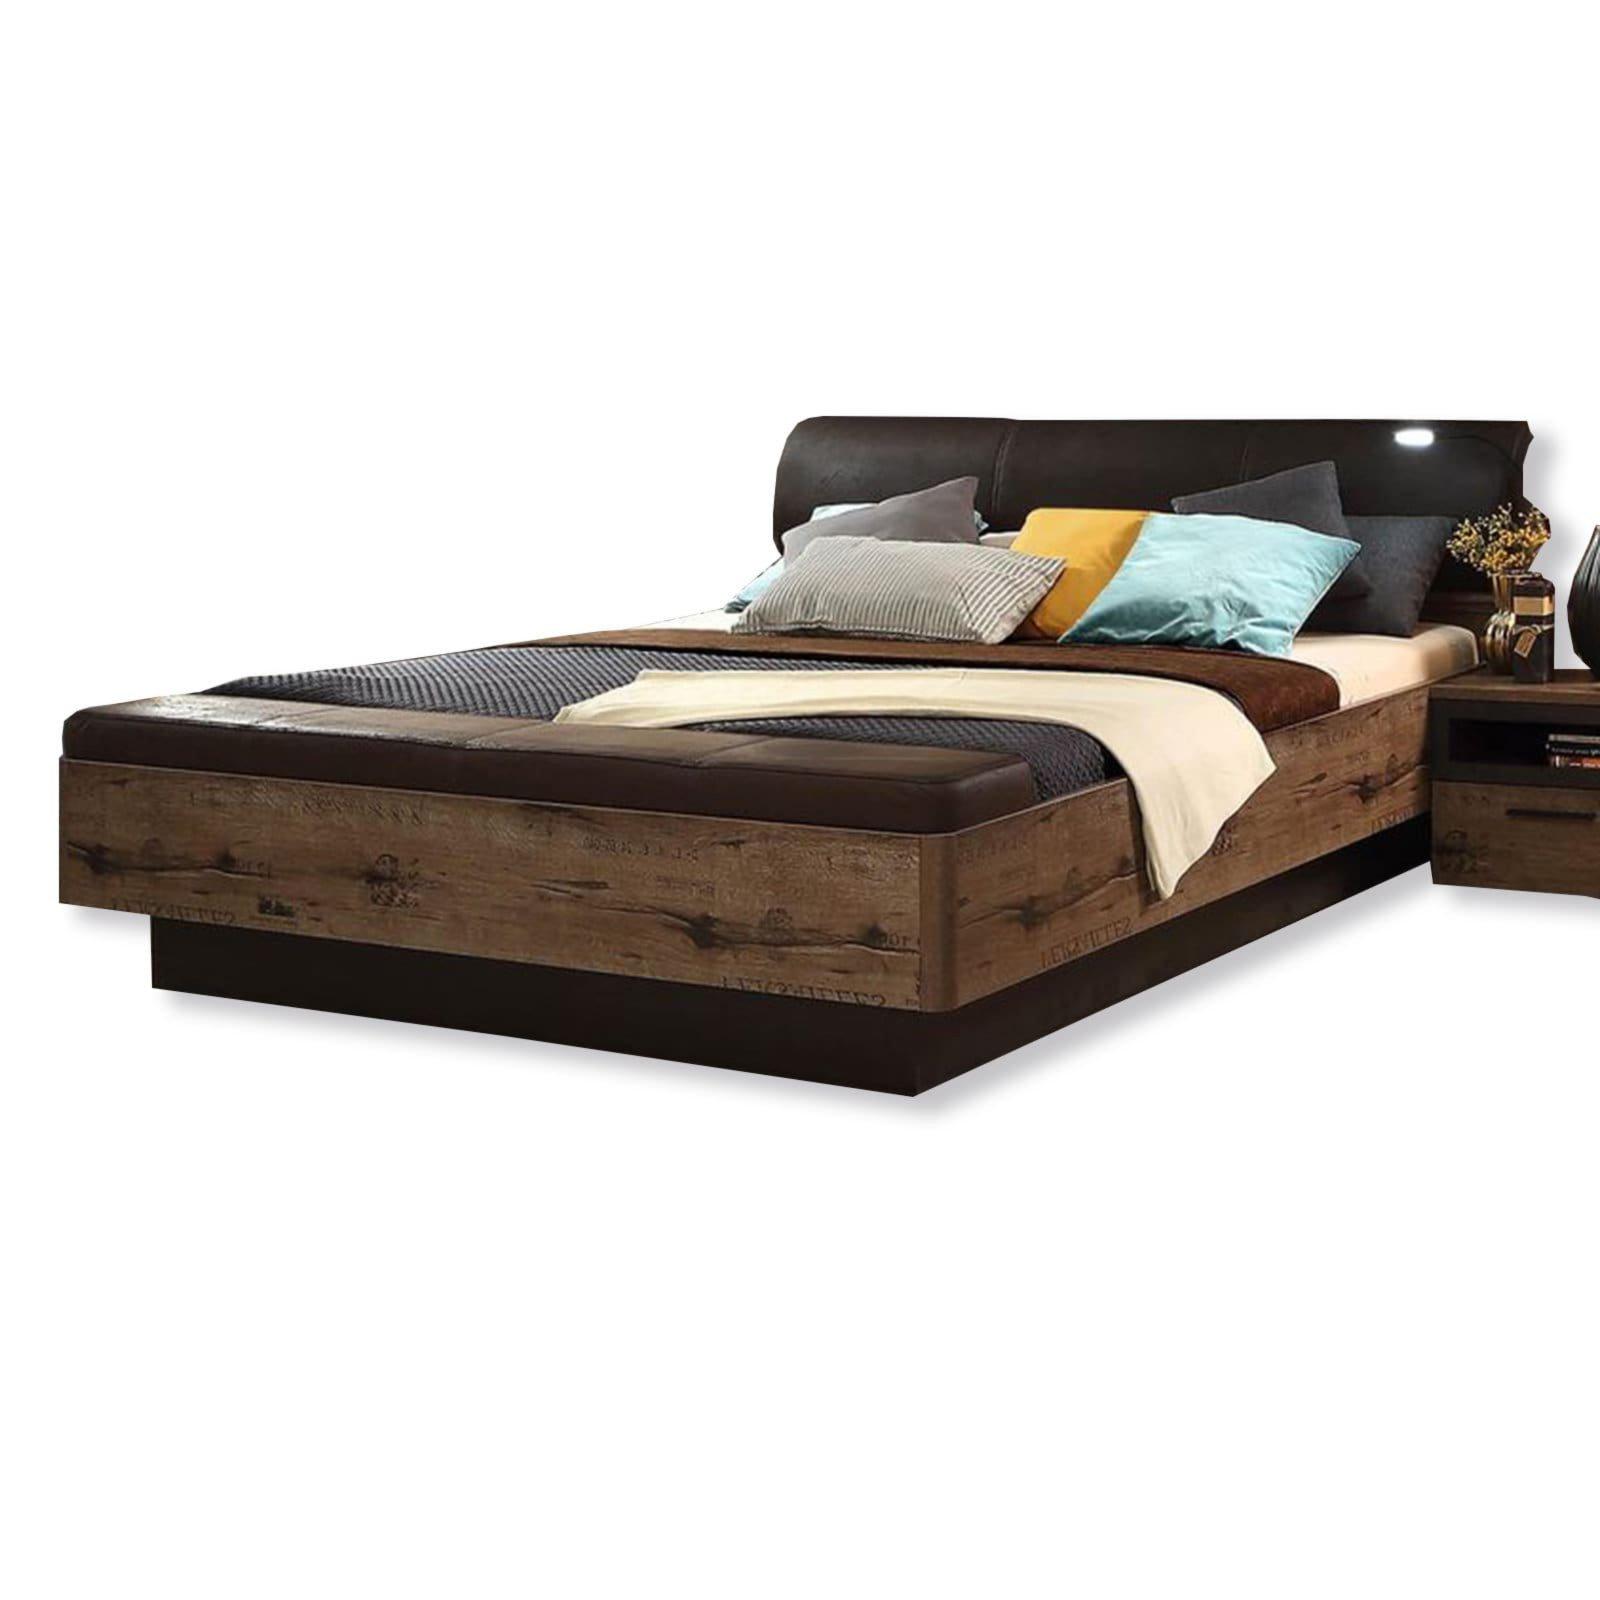 roller betten 120x200 awesome rollrost poco betondekor. Black Bedroom Furniture Sets. Home Design Ideas